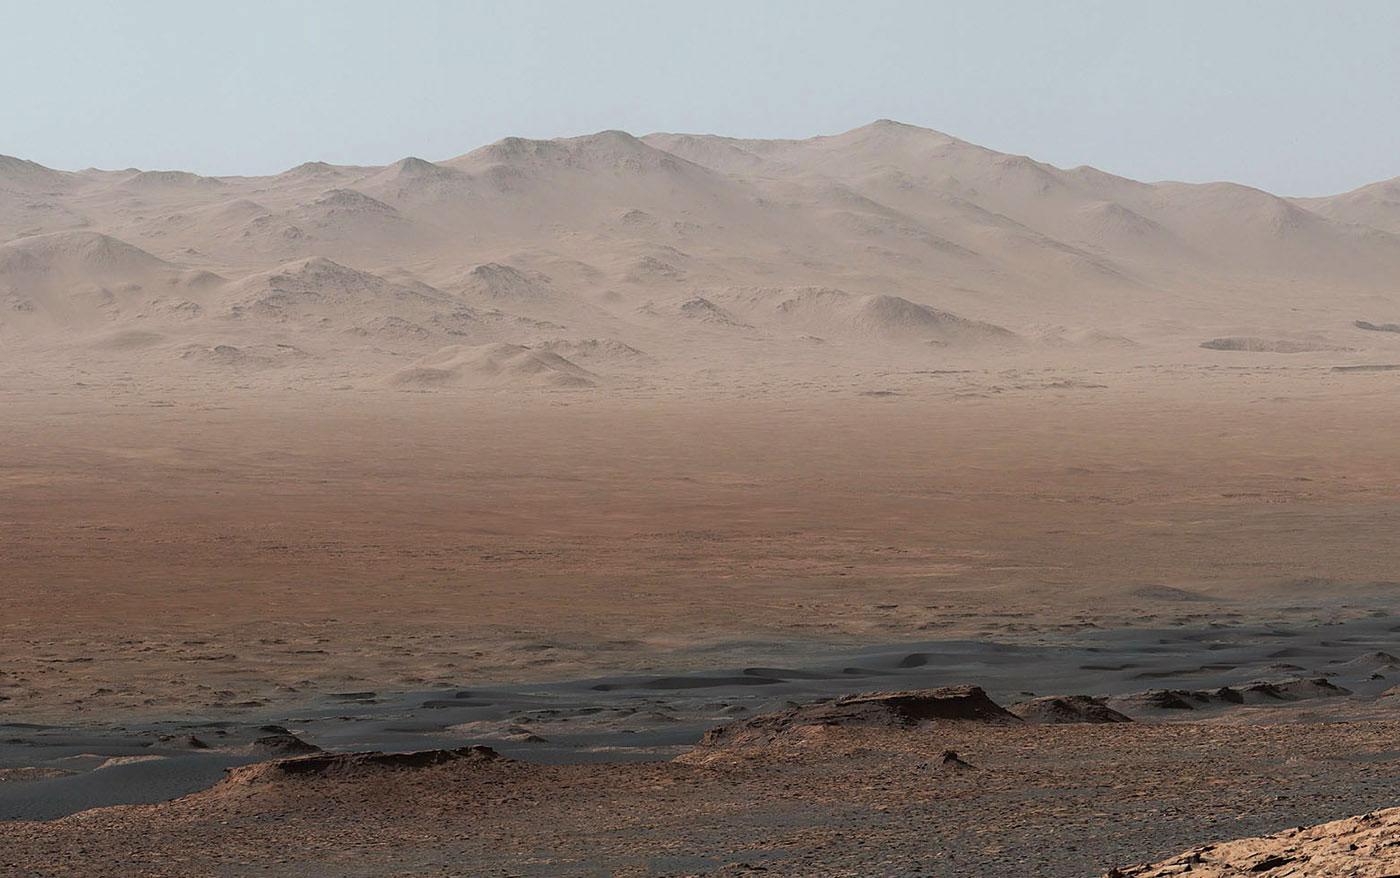 mars-curiousity-scenic-vista-2018-01-31-01-ed.jpg